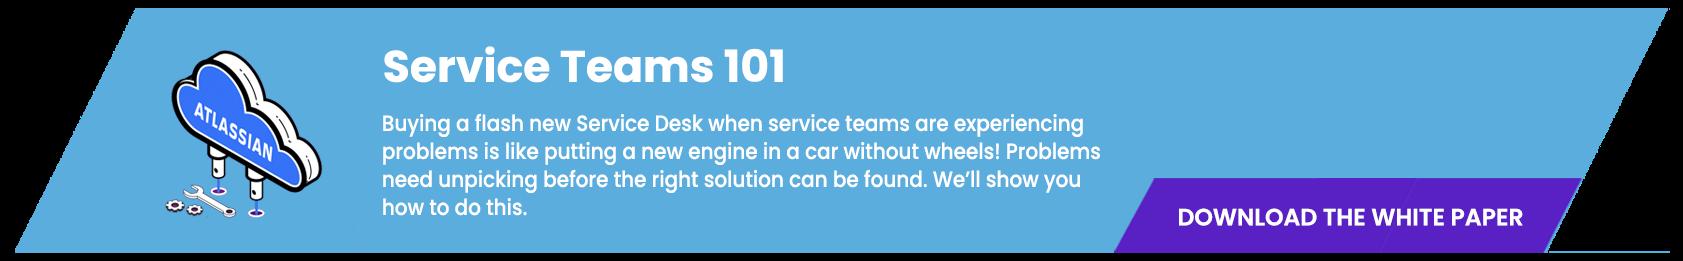 Service teams 101 White Paper